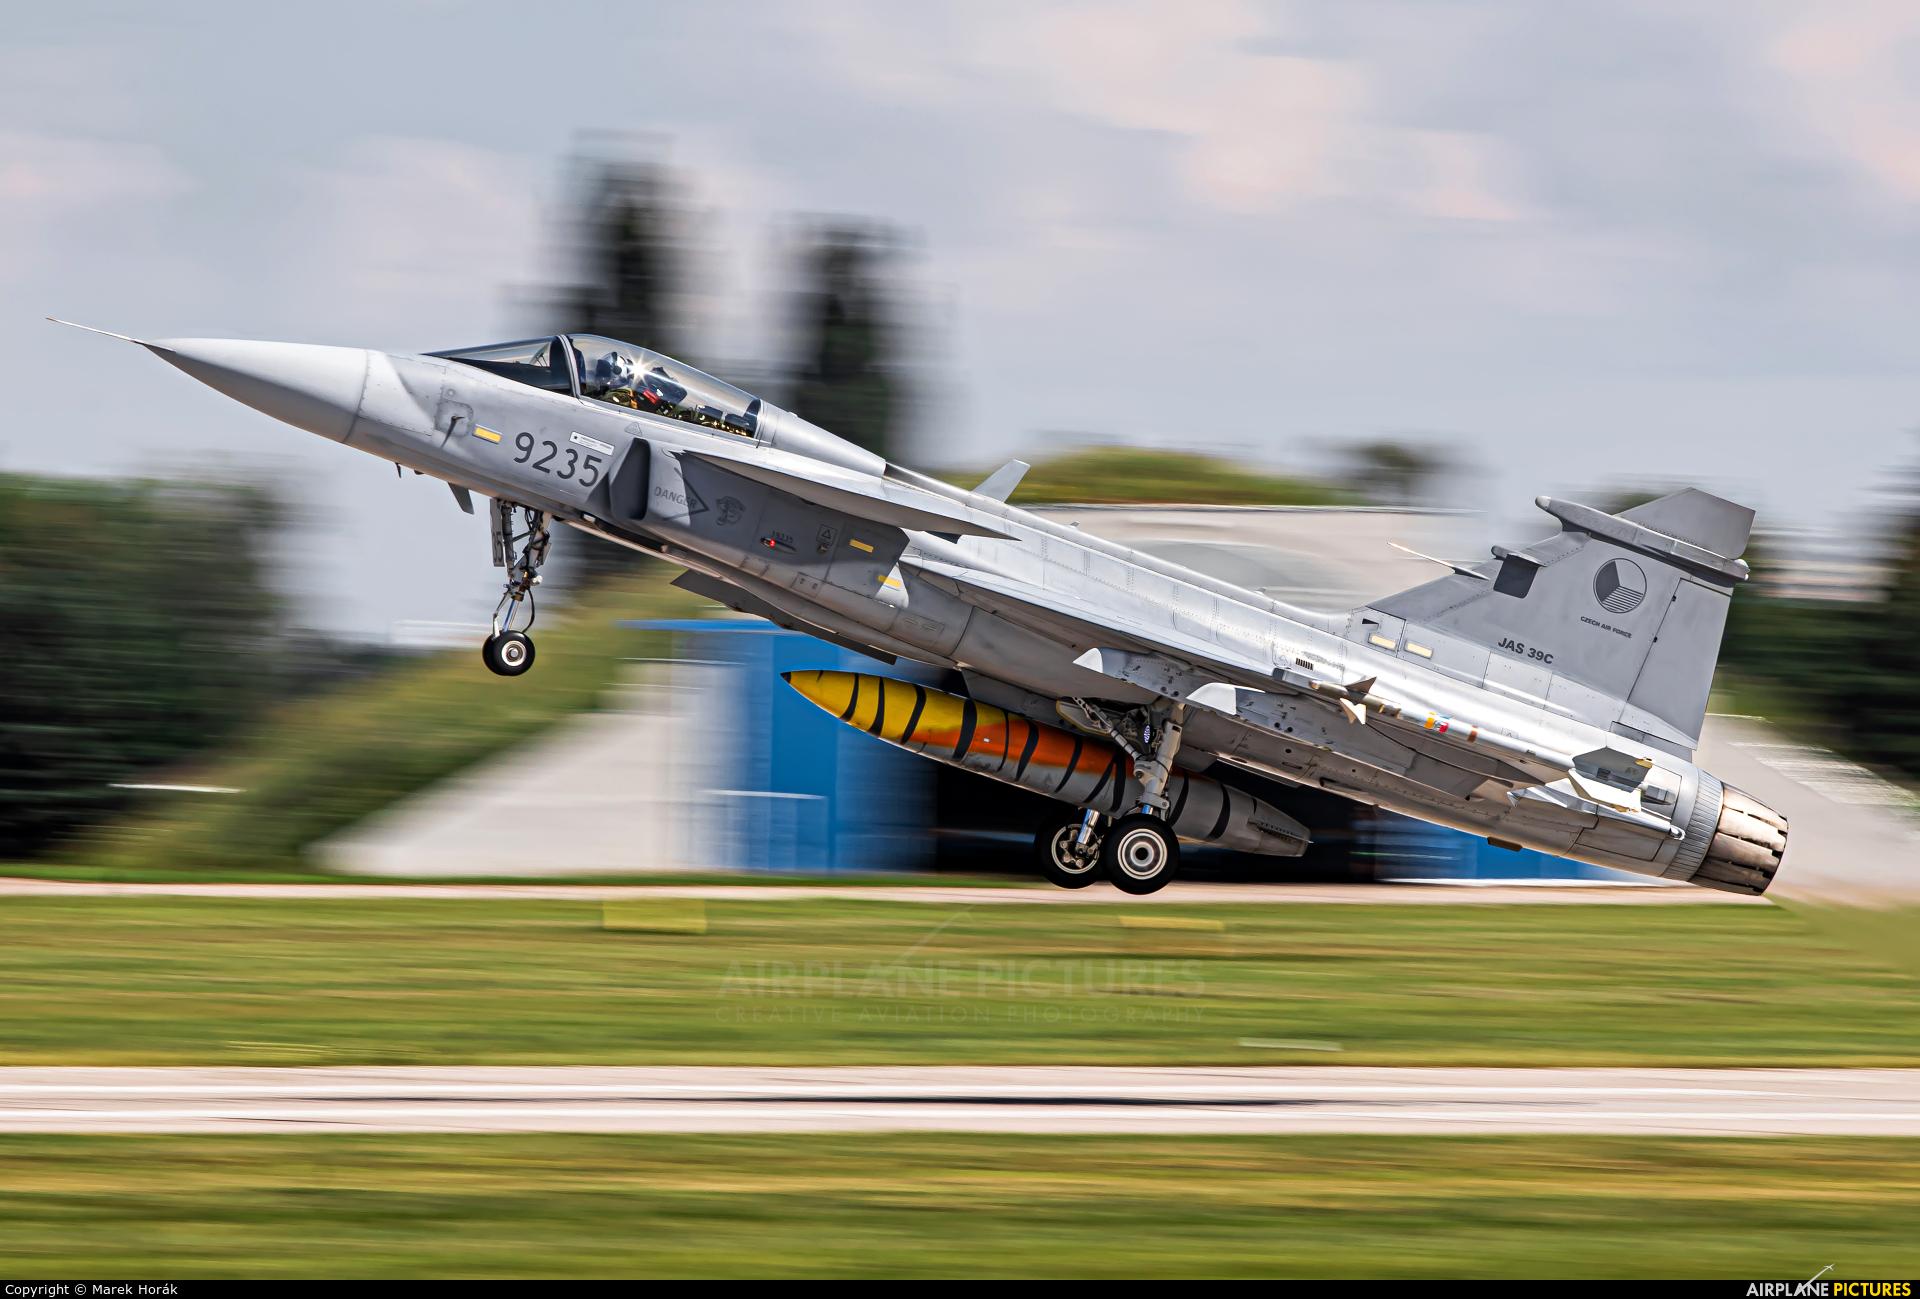 Czech - Air Force 9235 aircraft at Pardubice